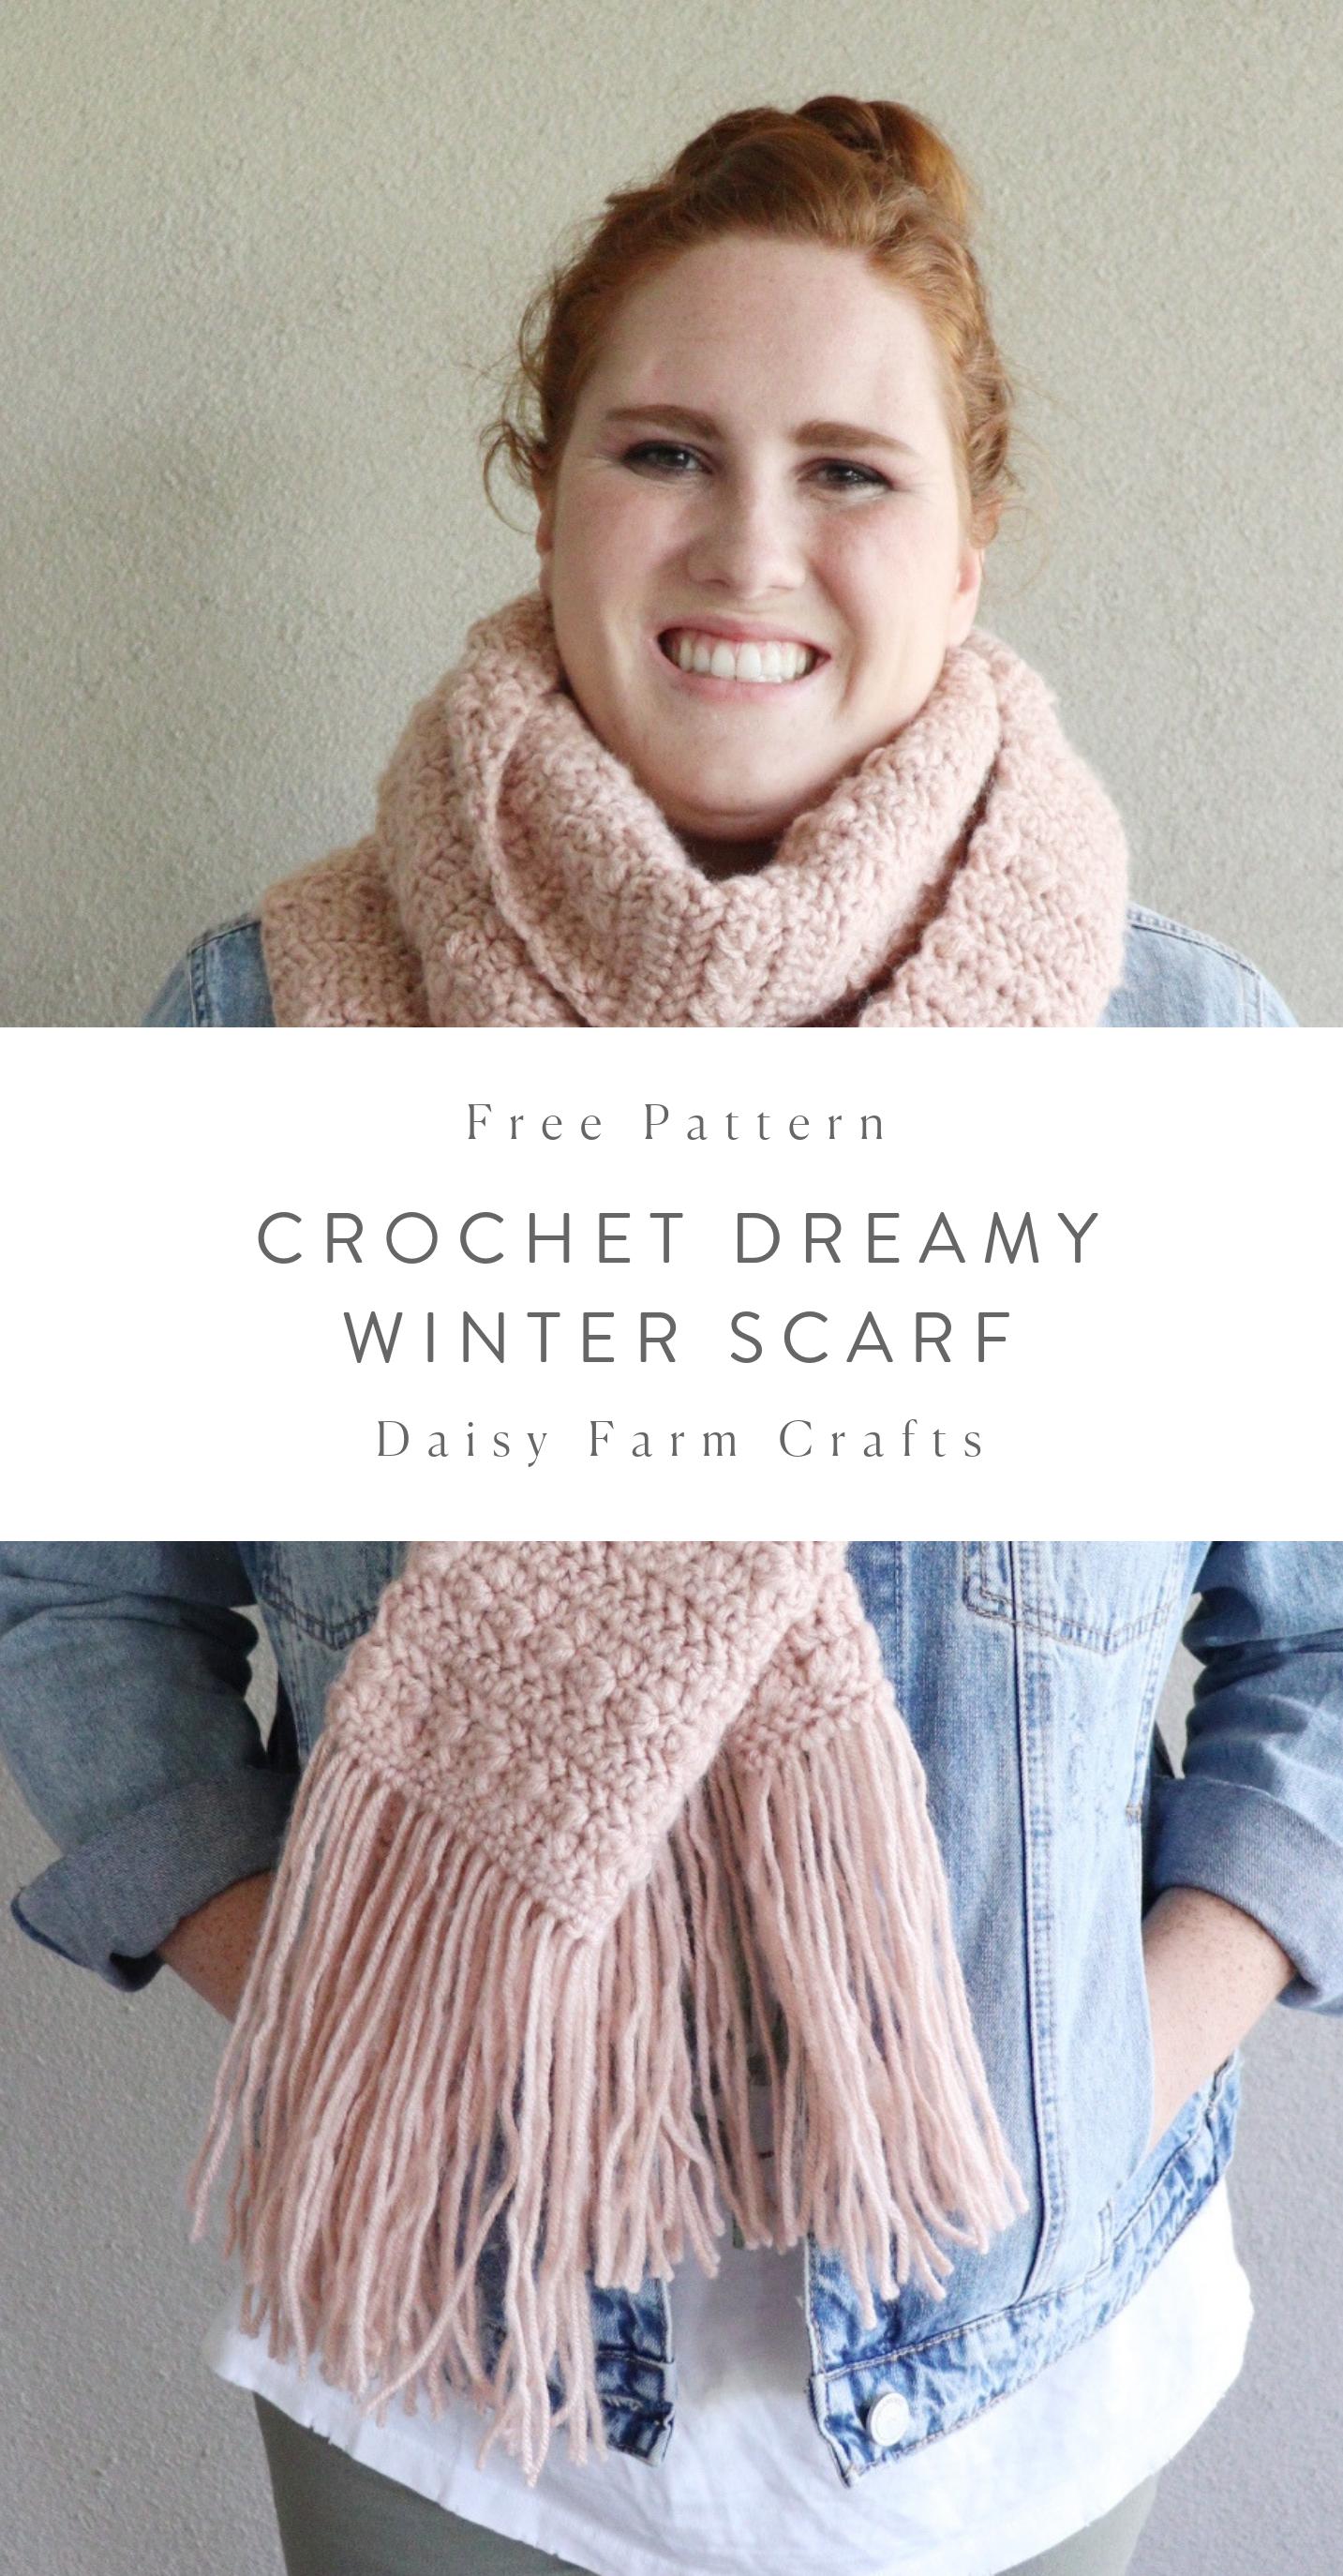 17 DIY Clothes Scarf free pattern ideas